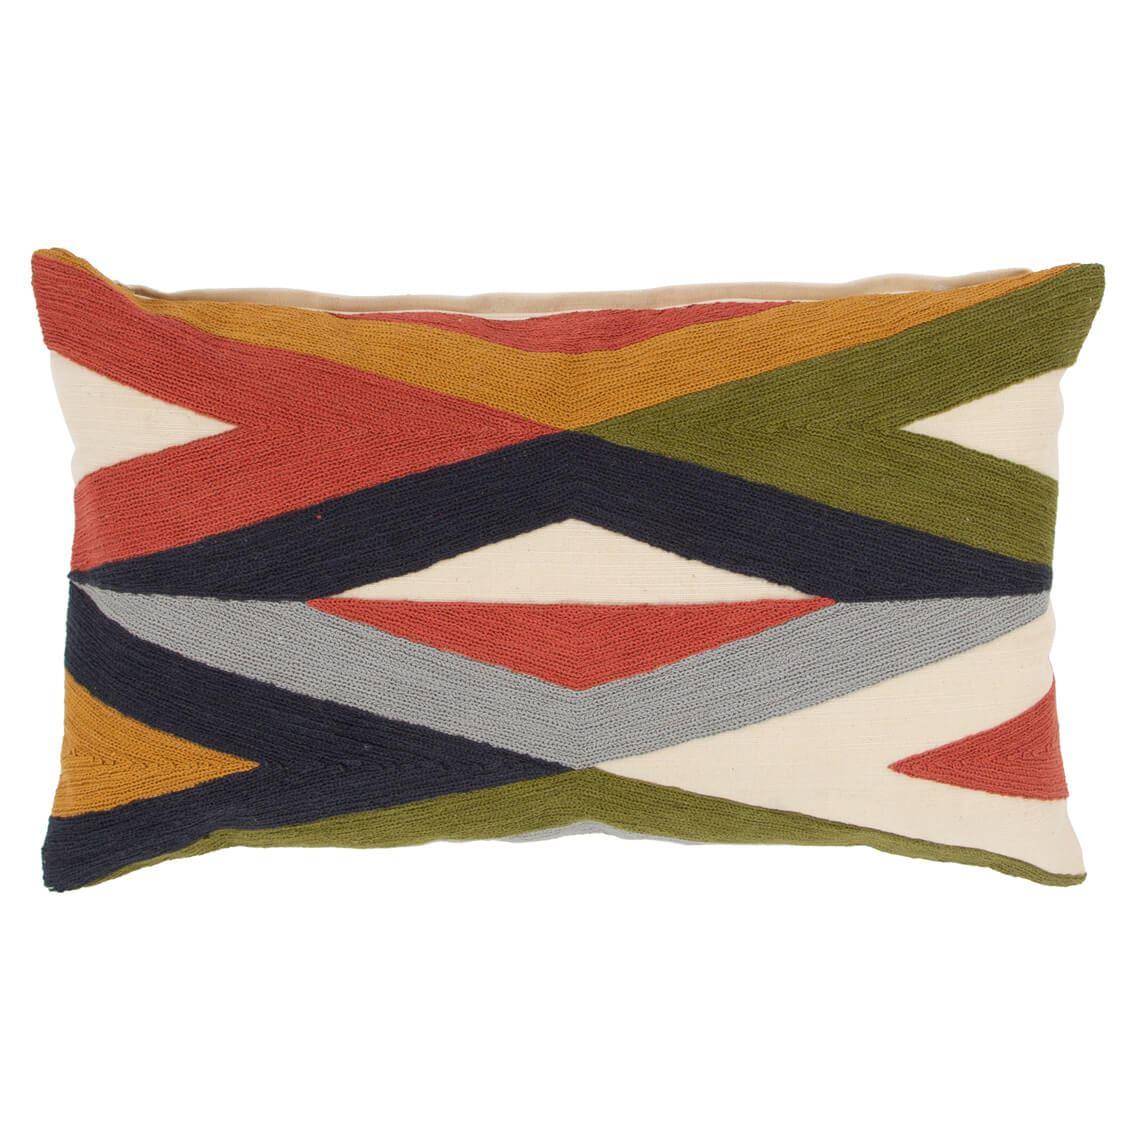 Rumsen Cushion Size W 50cm x D 30cm x H 10cm 100% Cotton Freedom